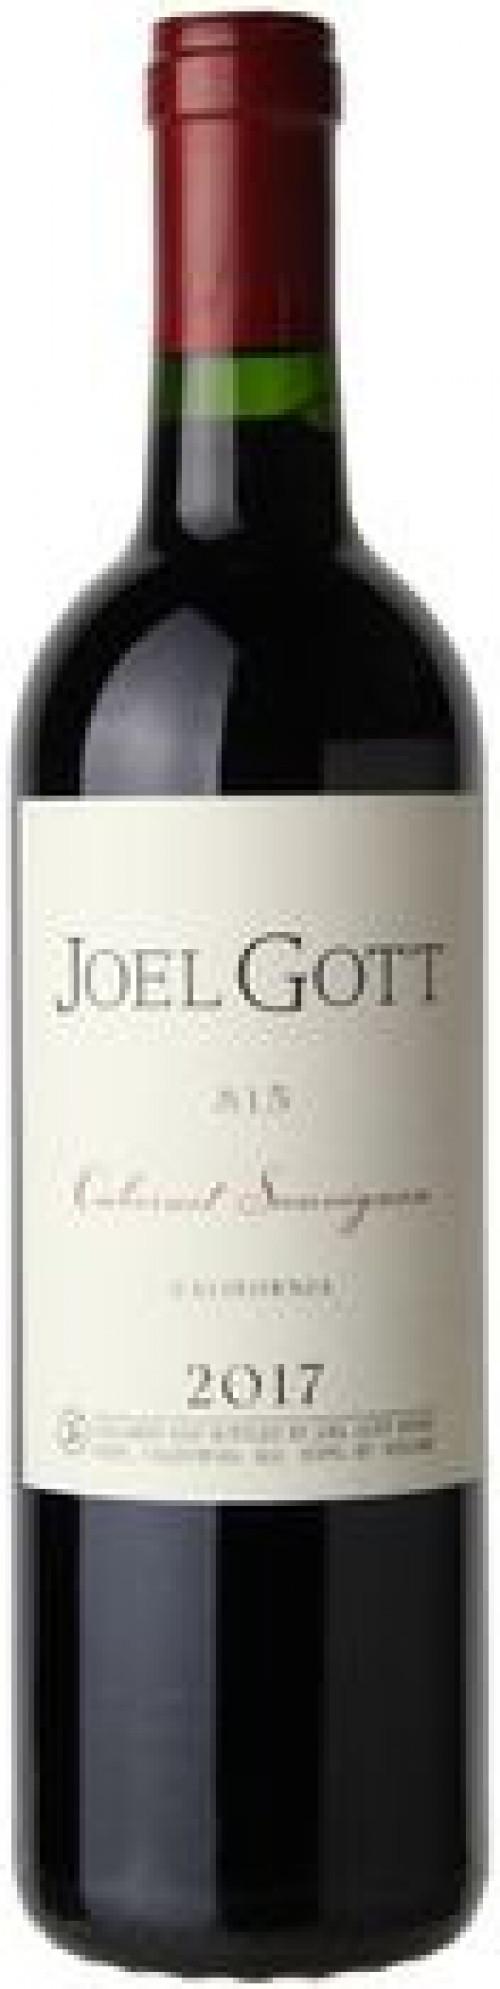 Joel Gott Cabernet Sauvignon 750ml